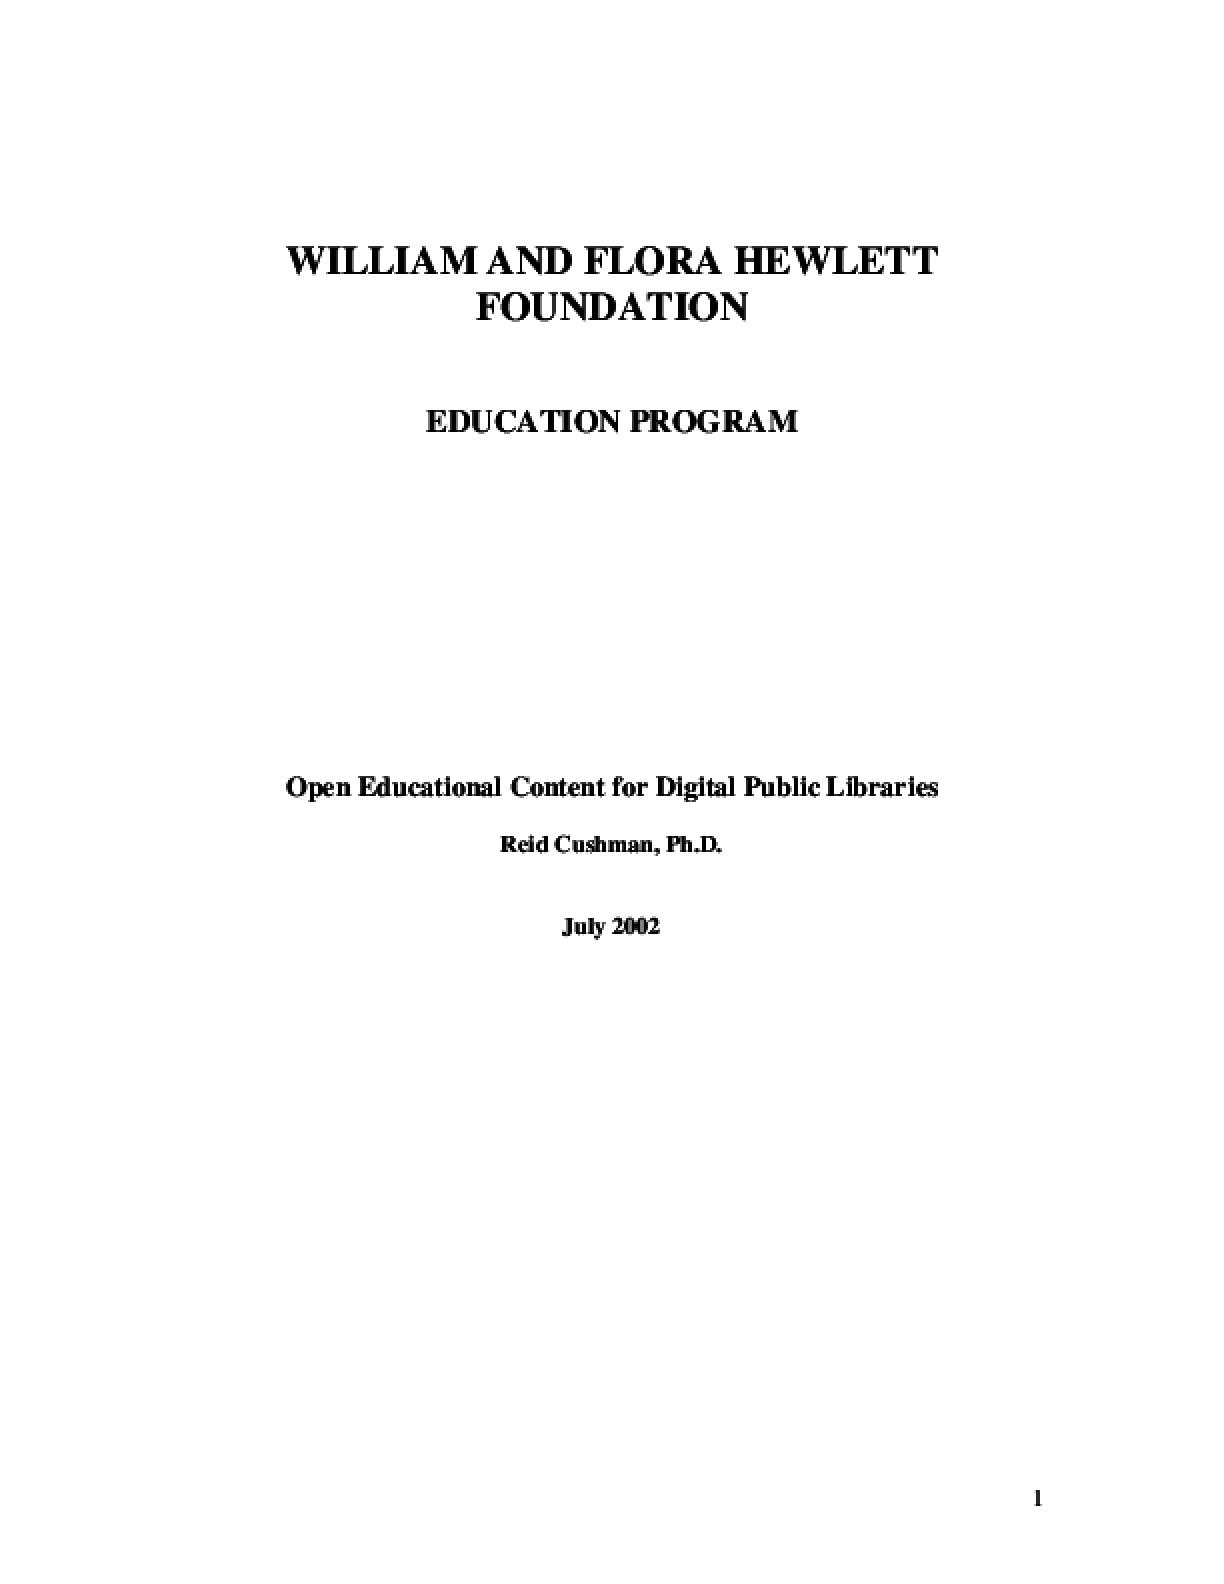 Open Educational Content for Public Digital Libraries